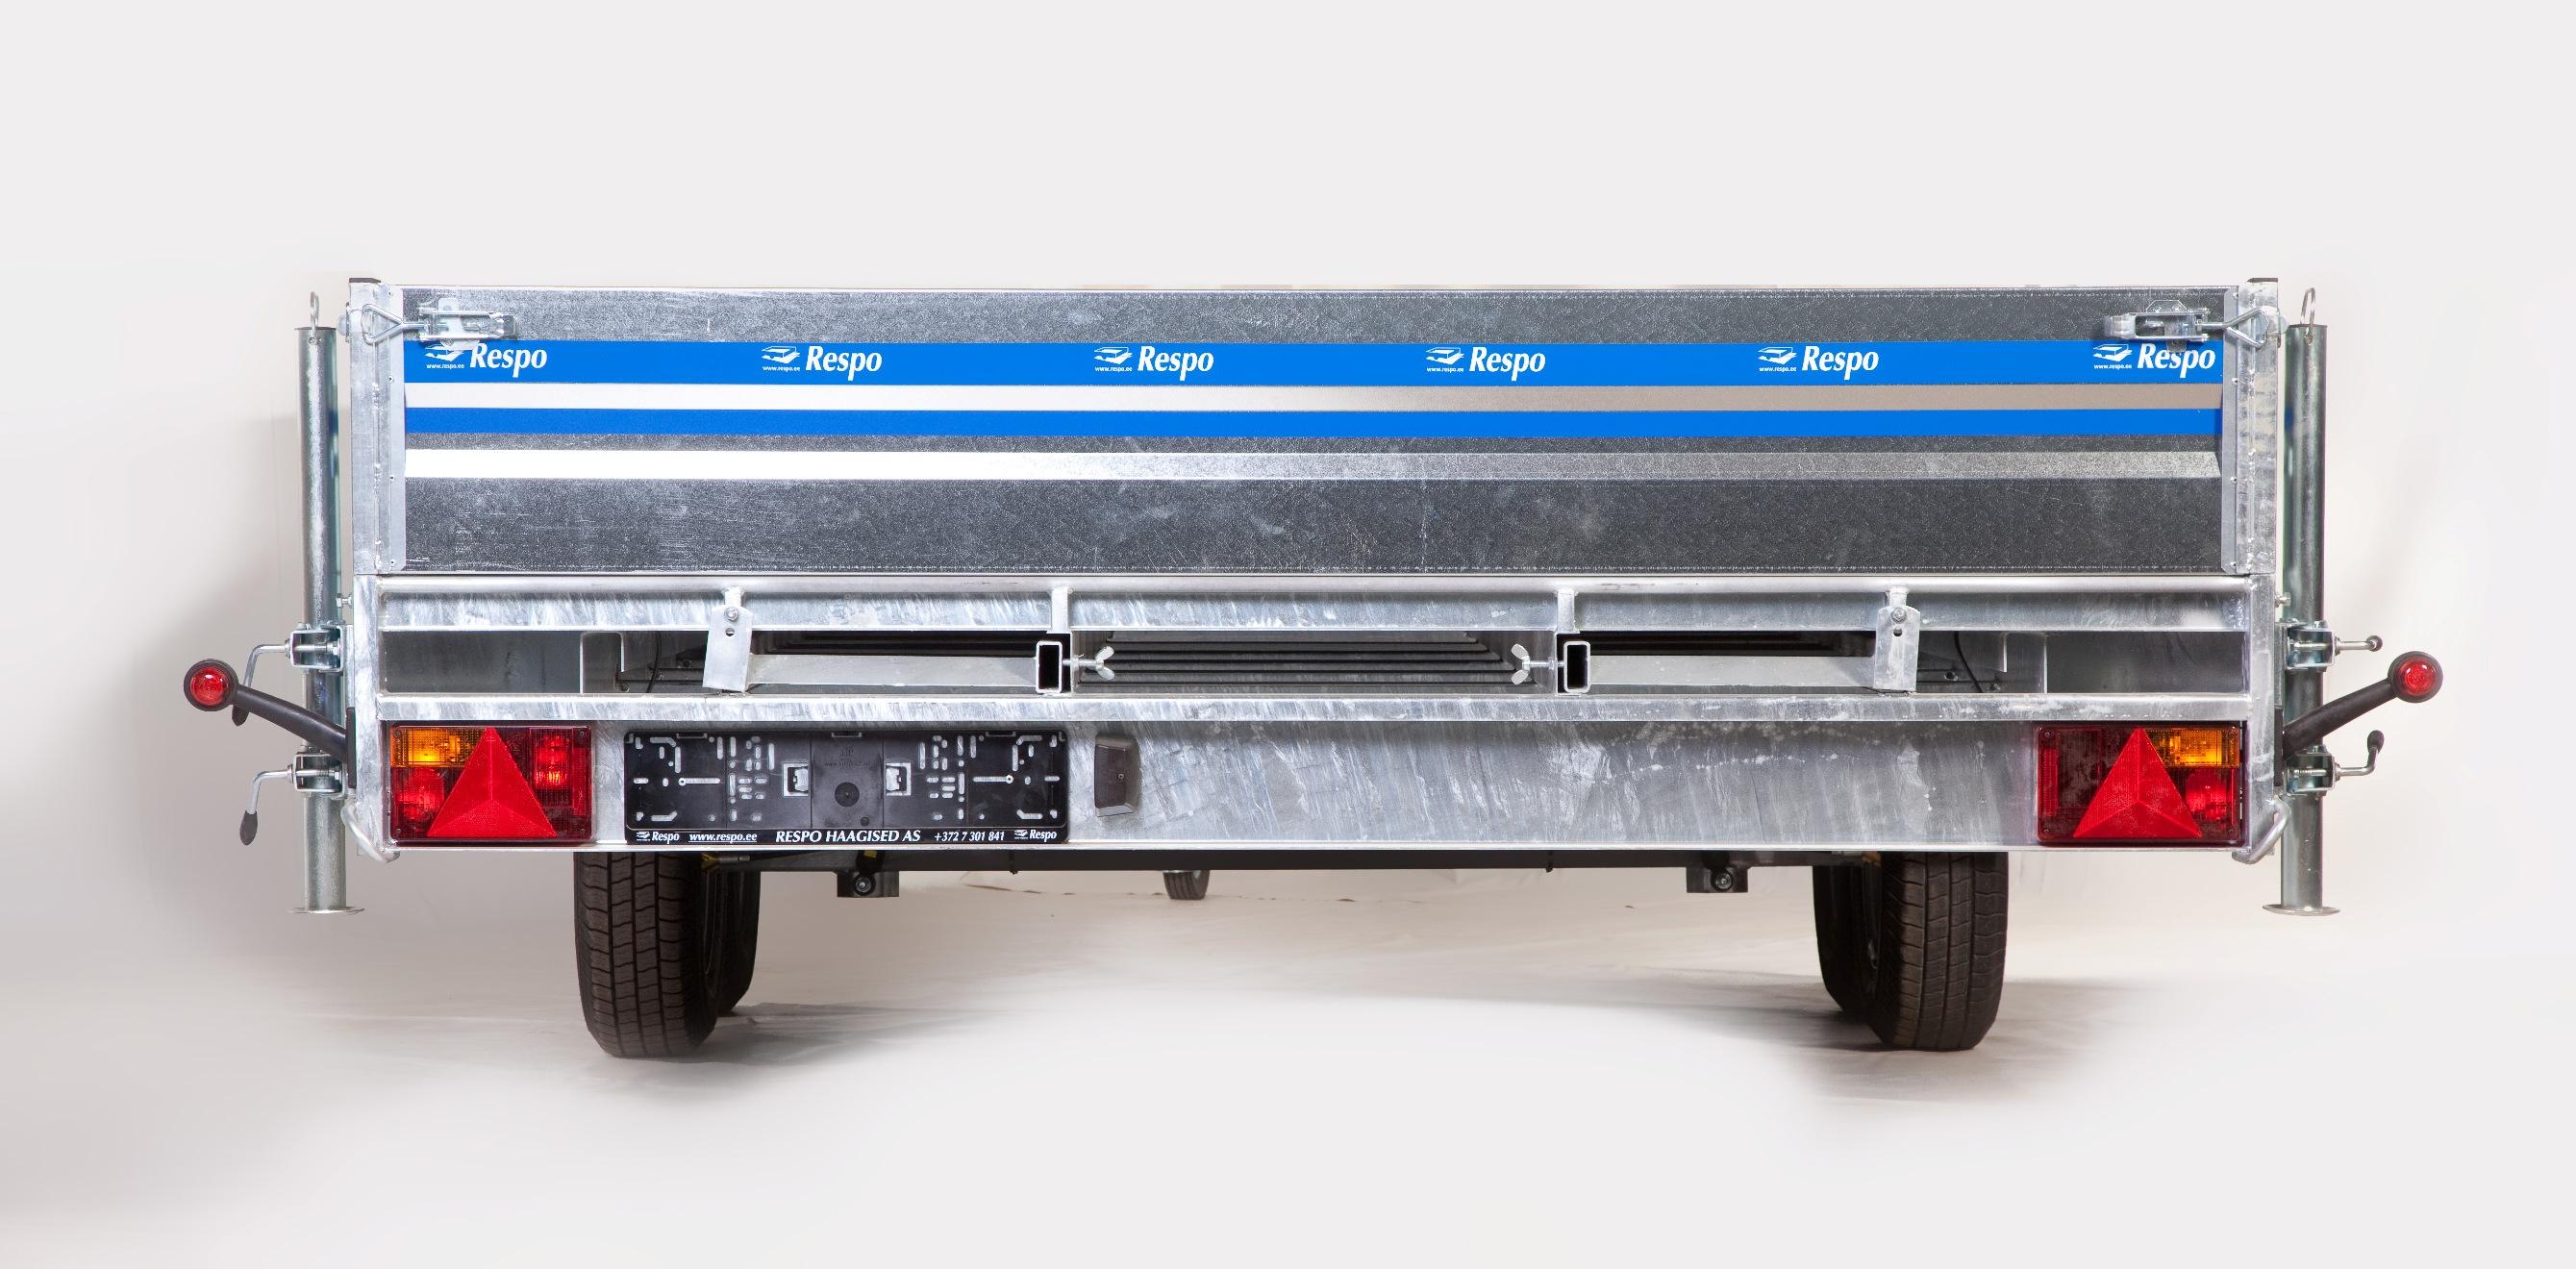 Легковой прицеп платформа Респо P55L2 фото 2